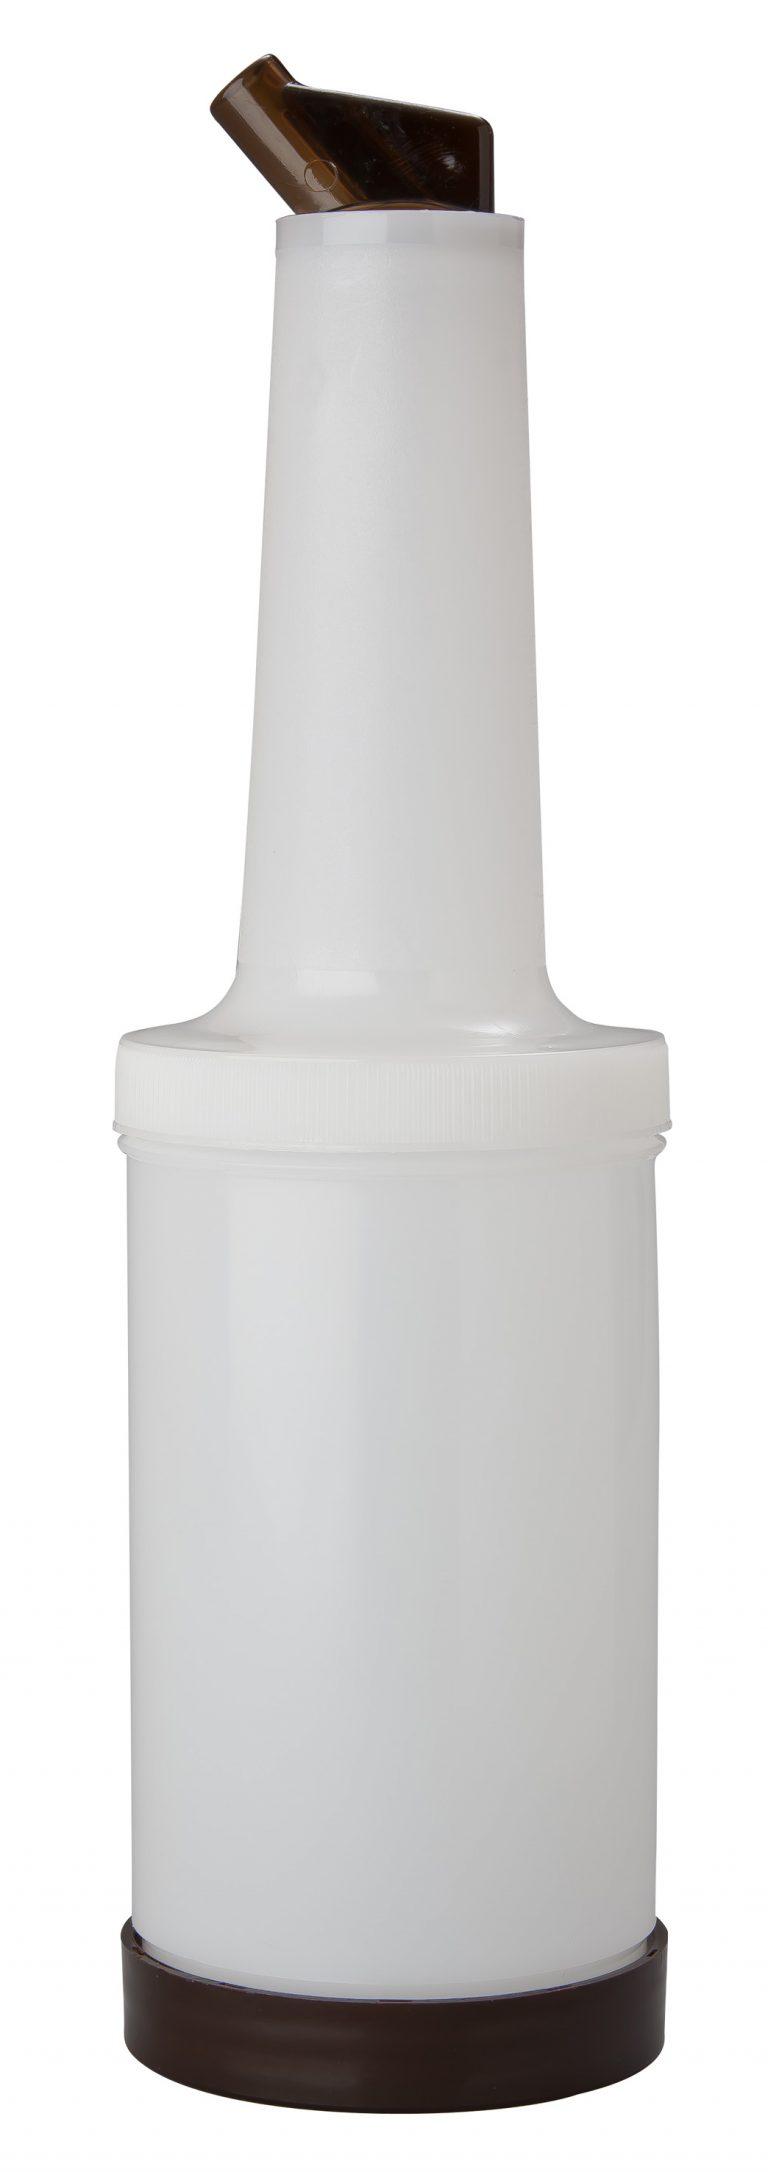 Save & Pour Bottle - Brown